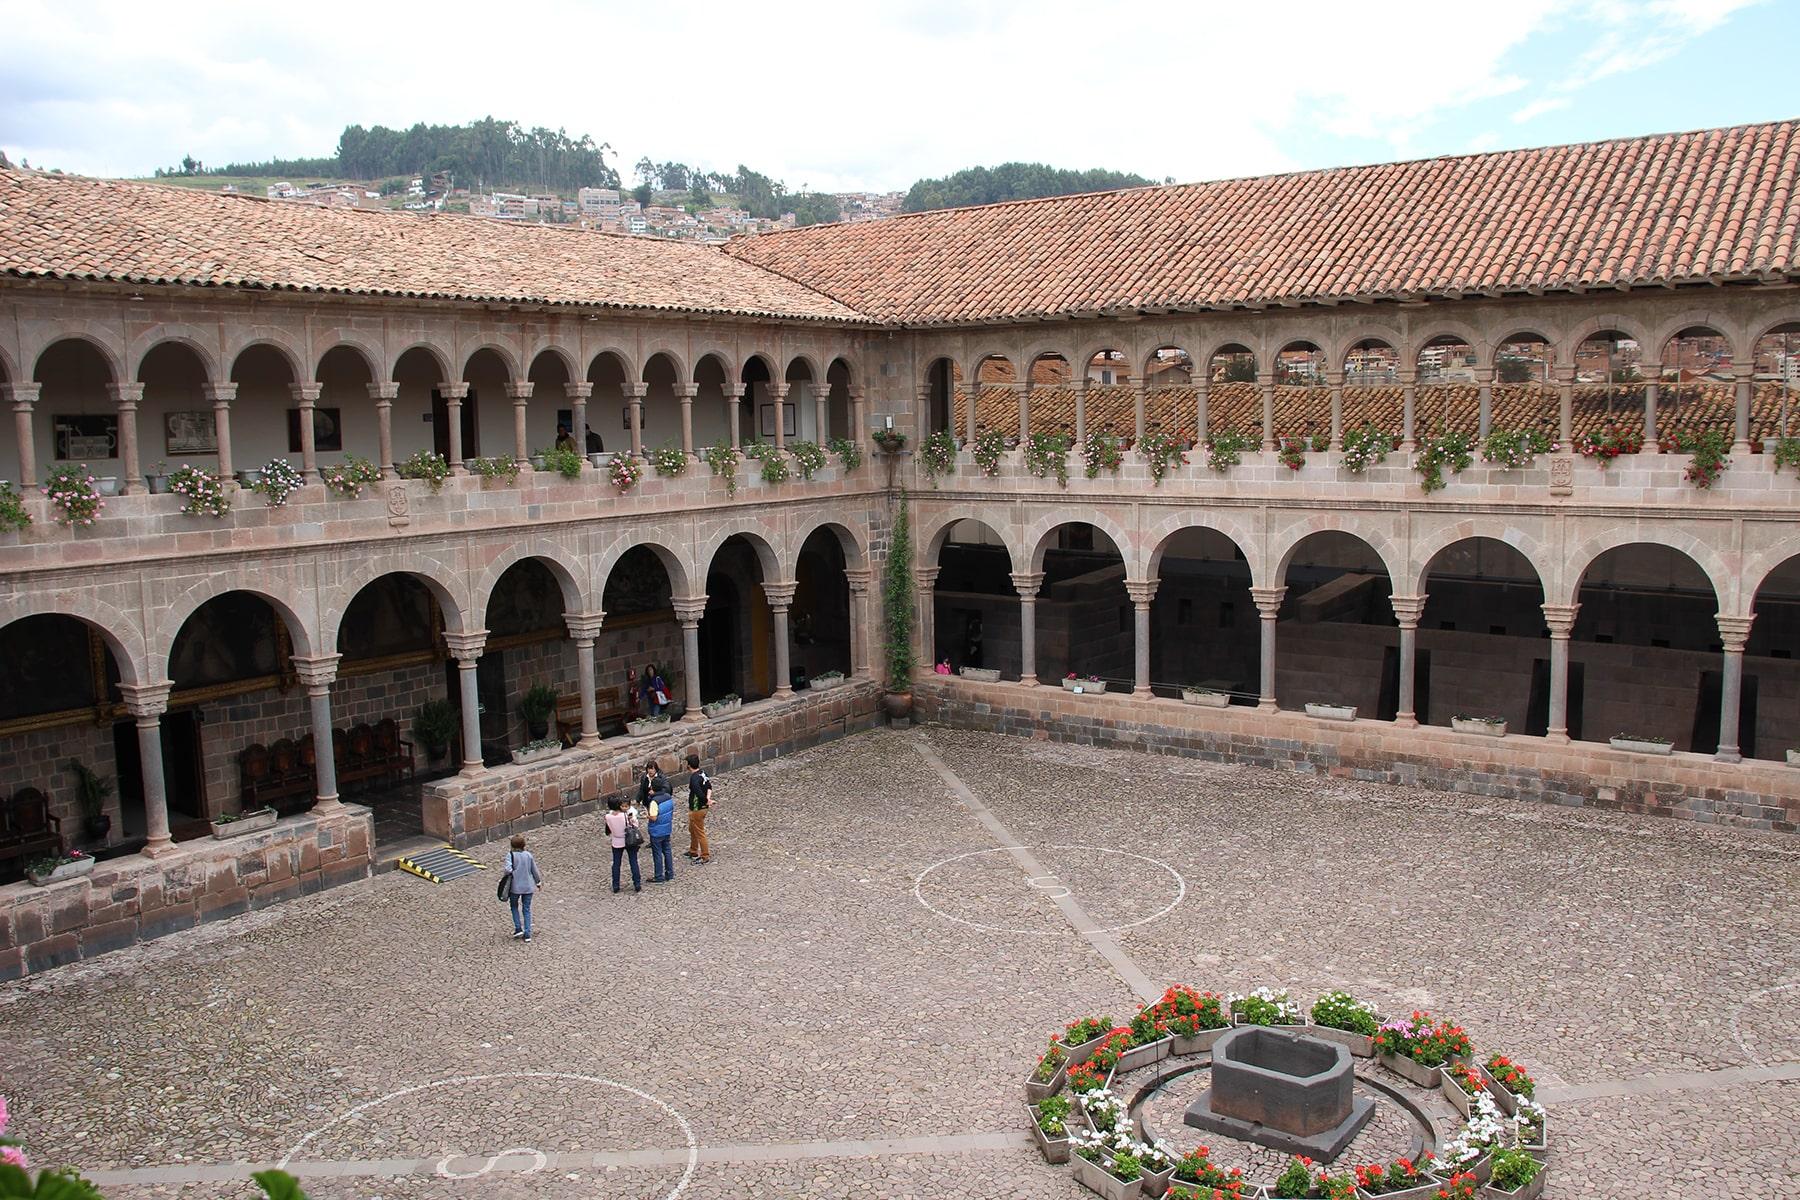 Eglise de Qorikancha, Cuzco